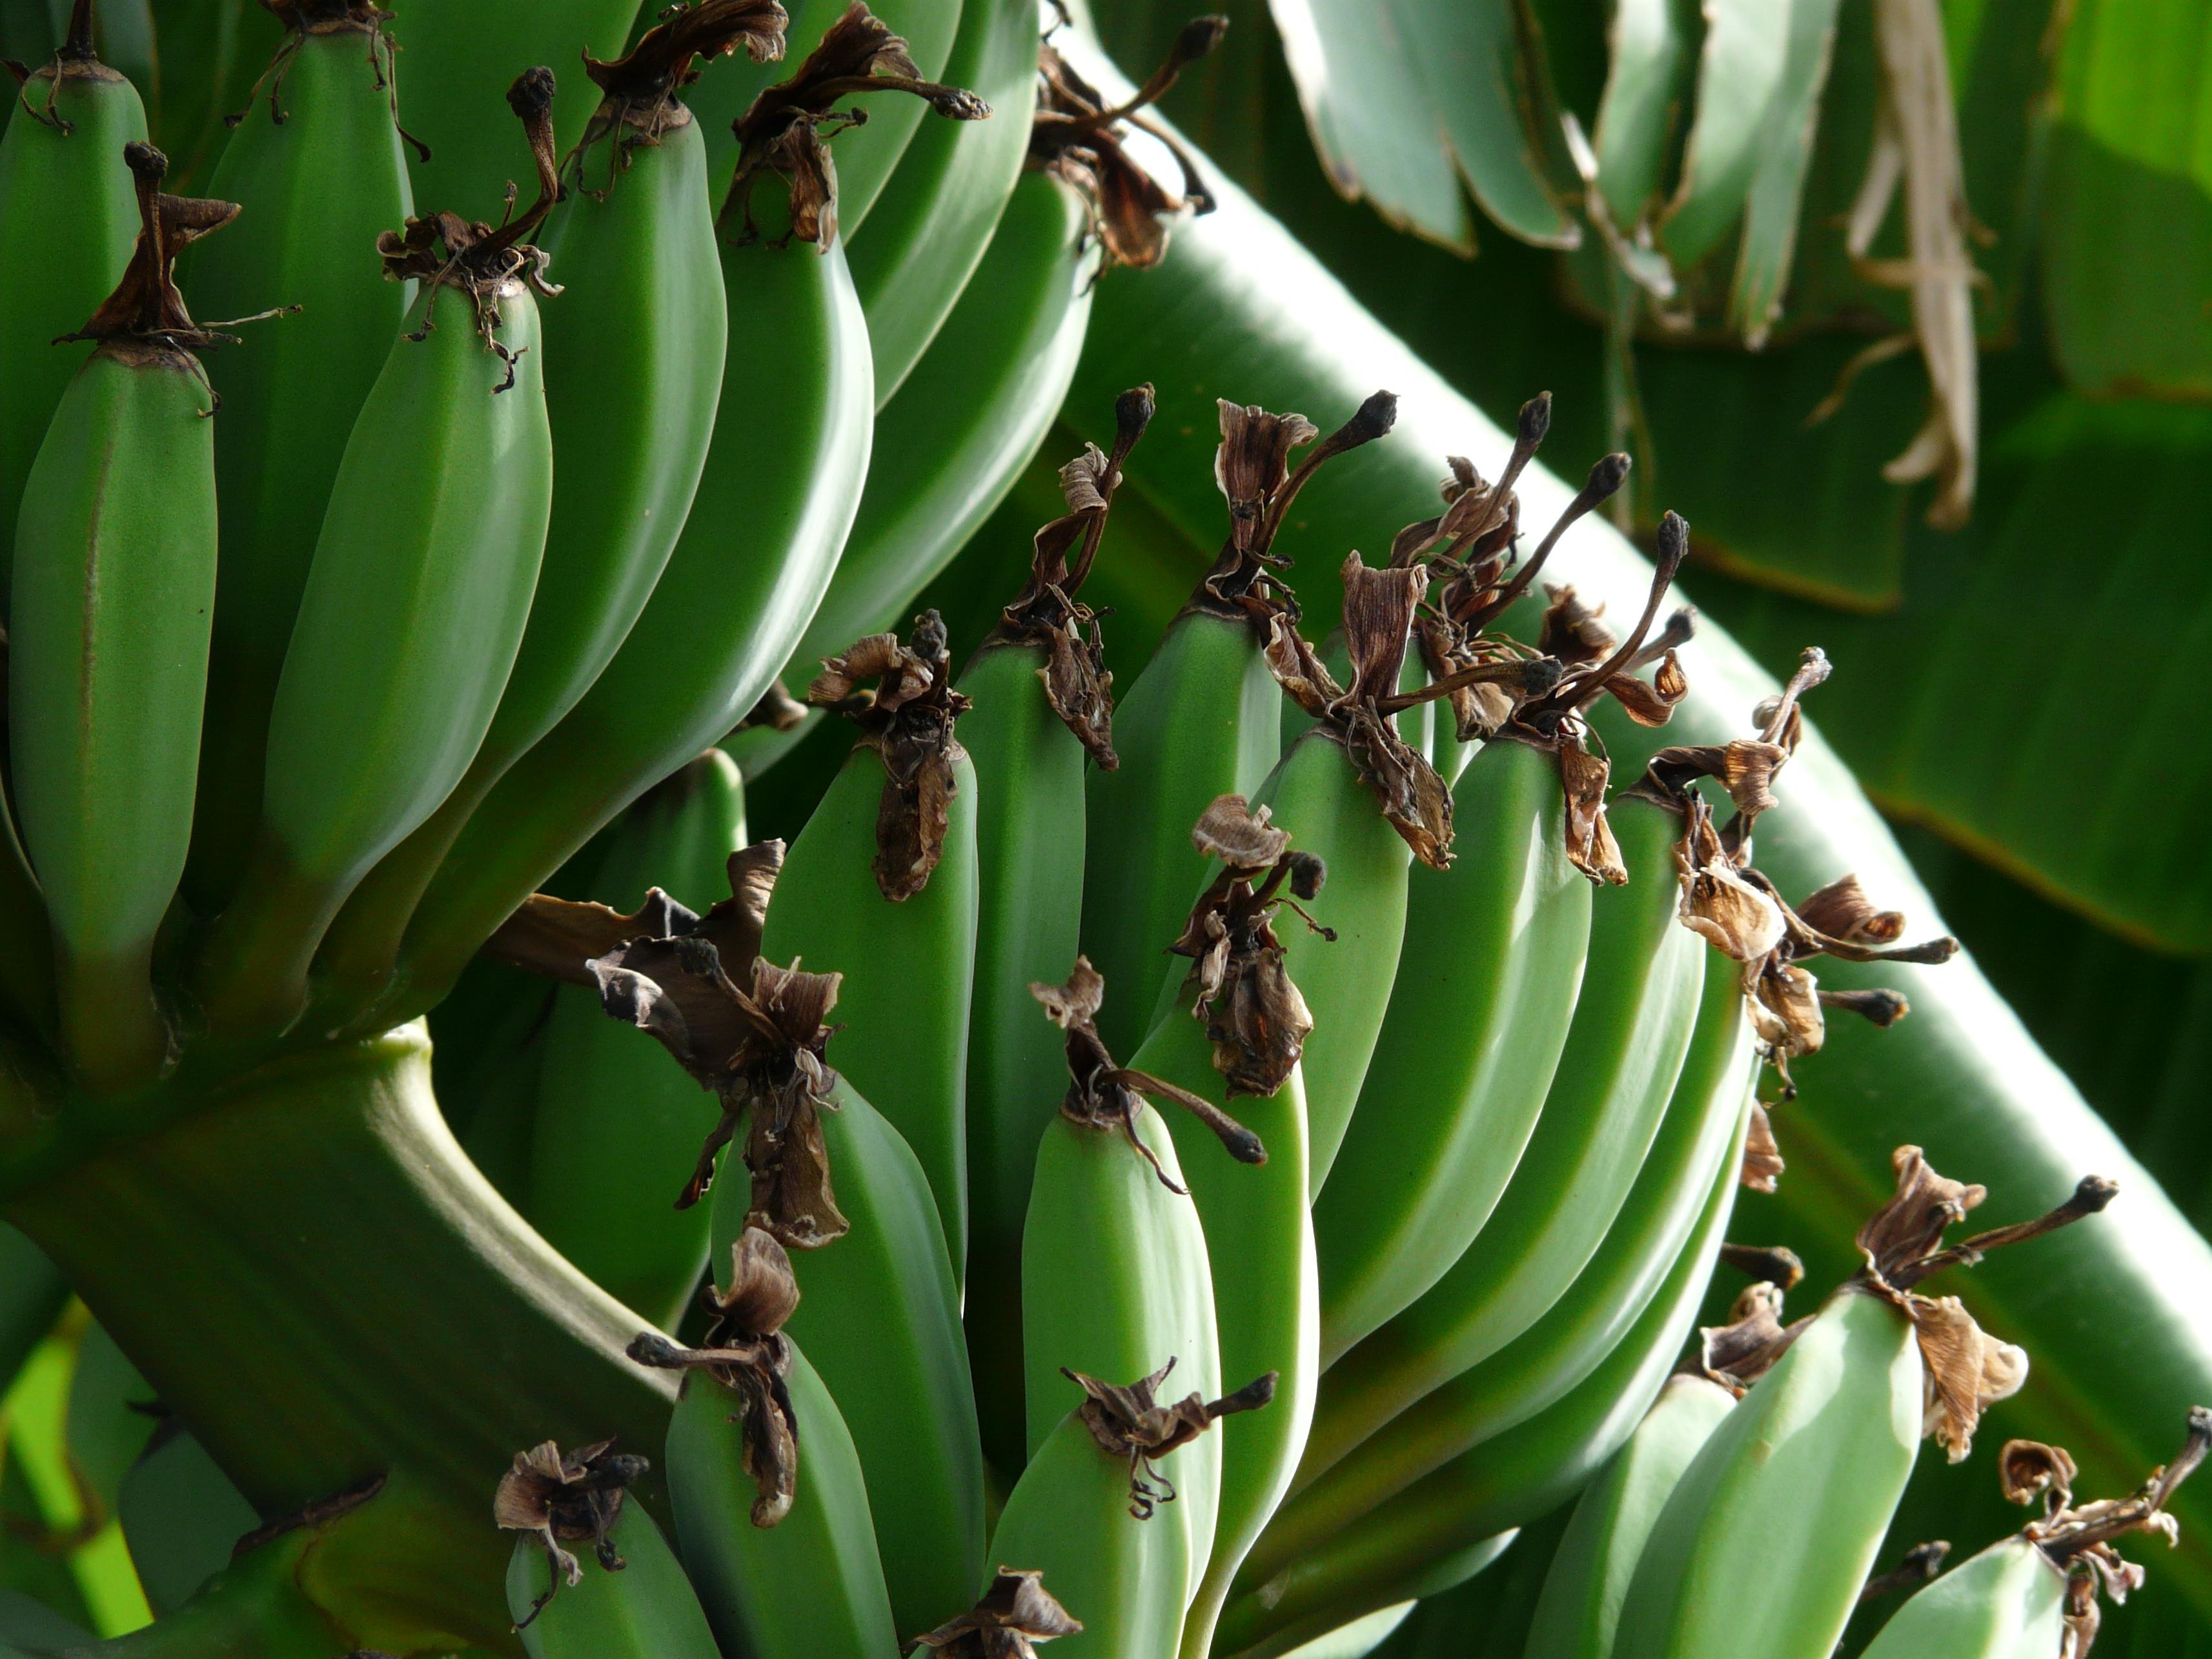 Imagen Gratis Pl Tano Hoja Naturaleza Flora Frutos  # Muebles Hoja De Banano